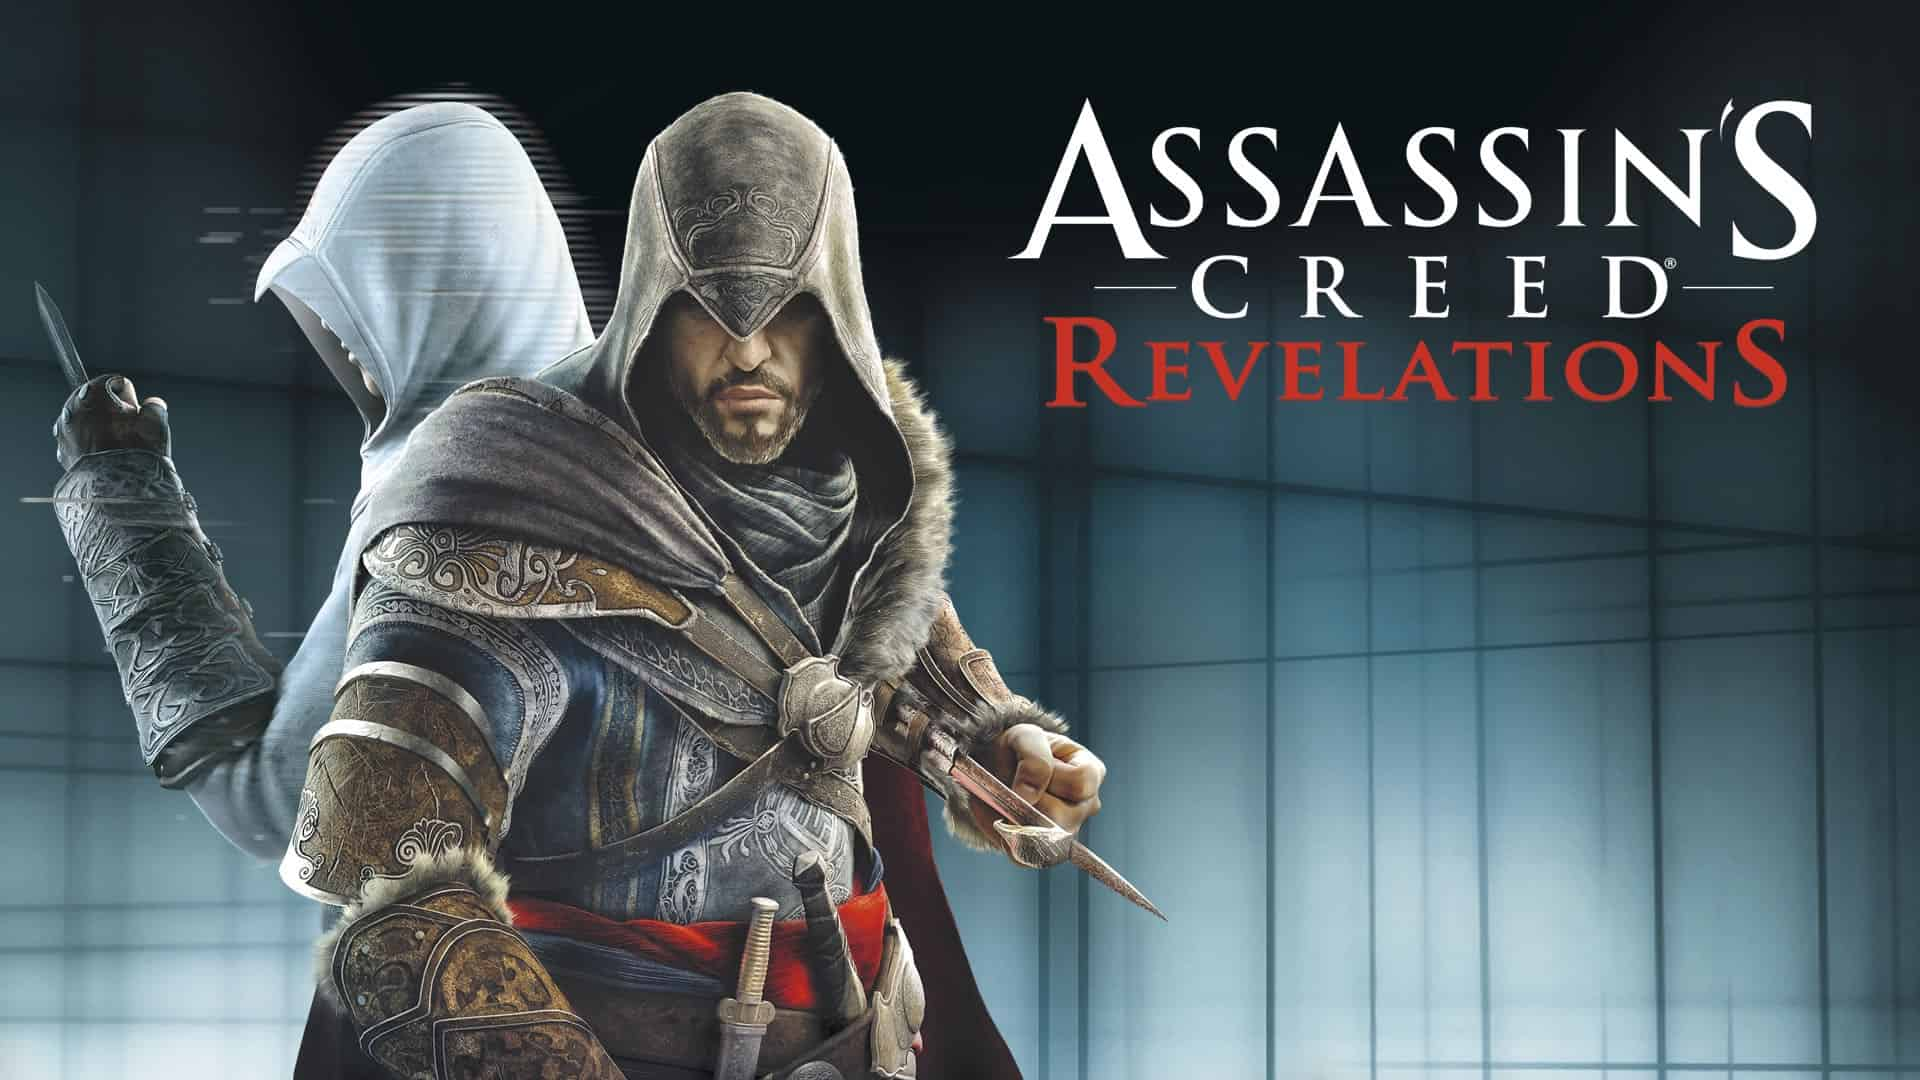 Best Assassins Creed Games - Assassins Creed Revelations